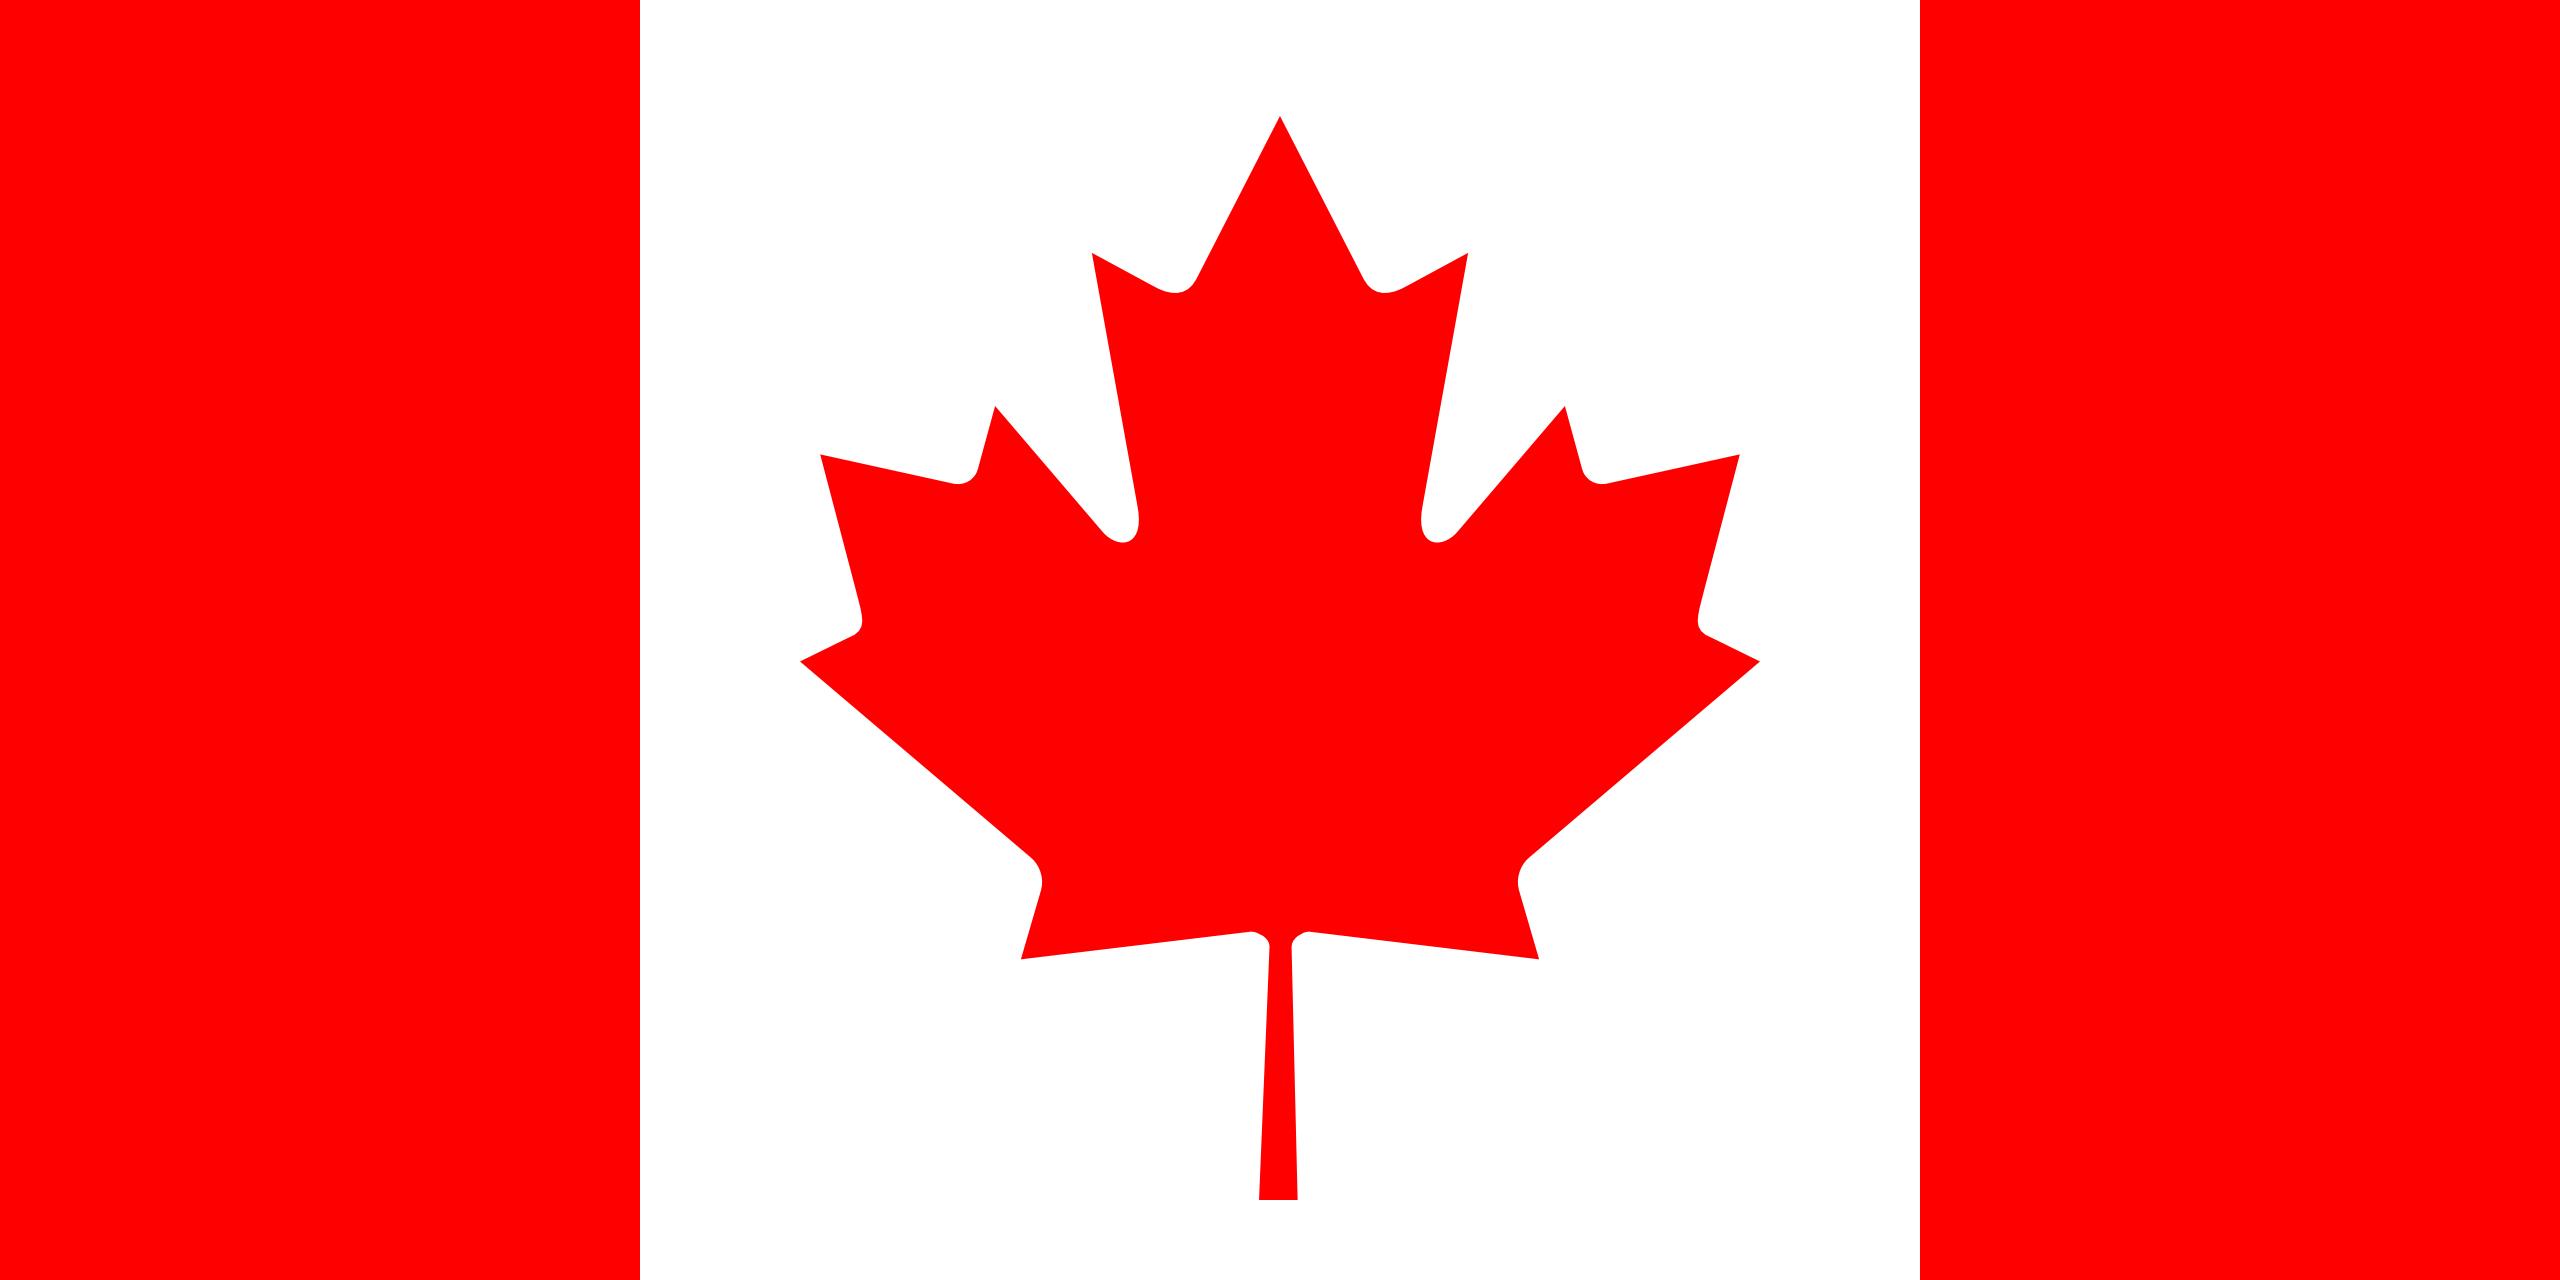 कनाडा, देश, emblema, लोग�प्रतीकbolo - HD वॉलपेपर - प्रोफेसर-falken.com